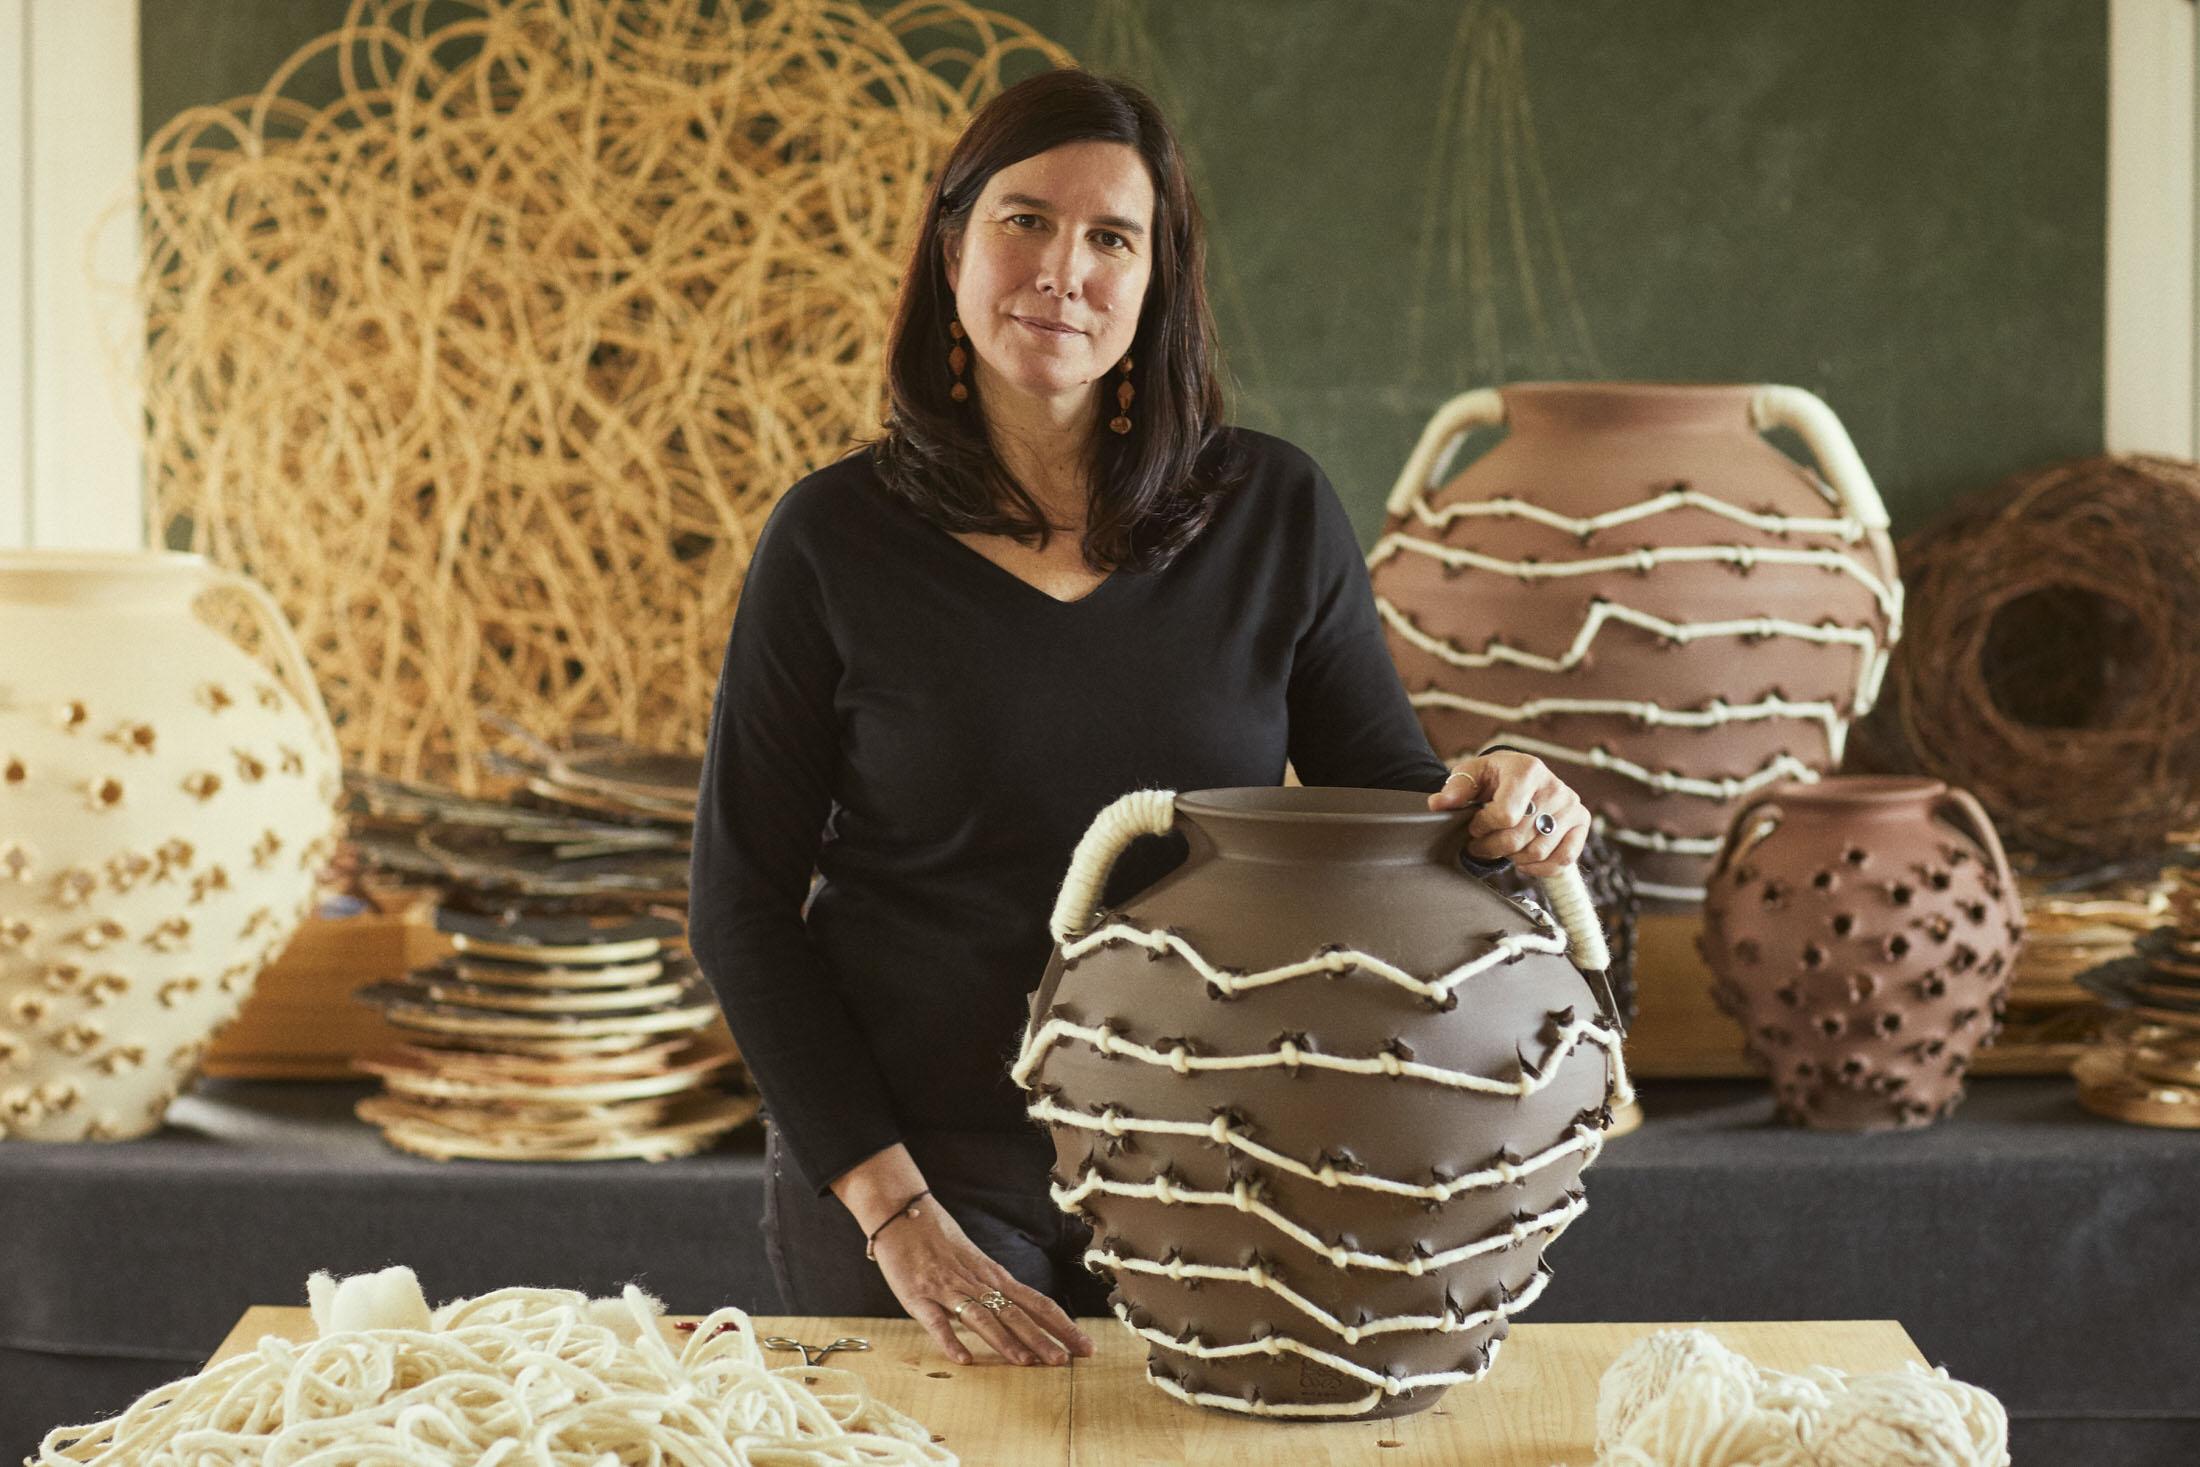 Loewe Waves Weaving Artist Idoia Cuesta Yellowtrace 10